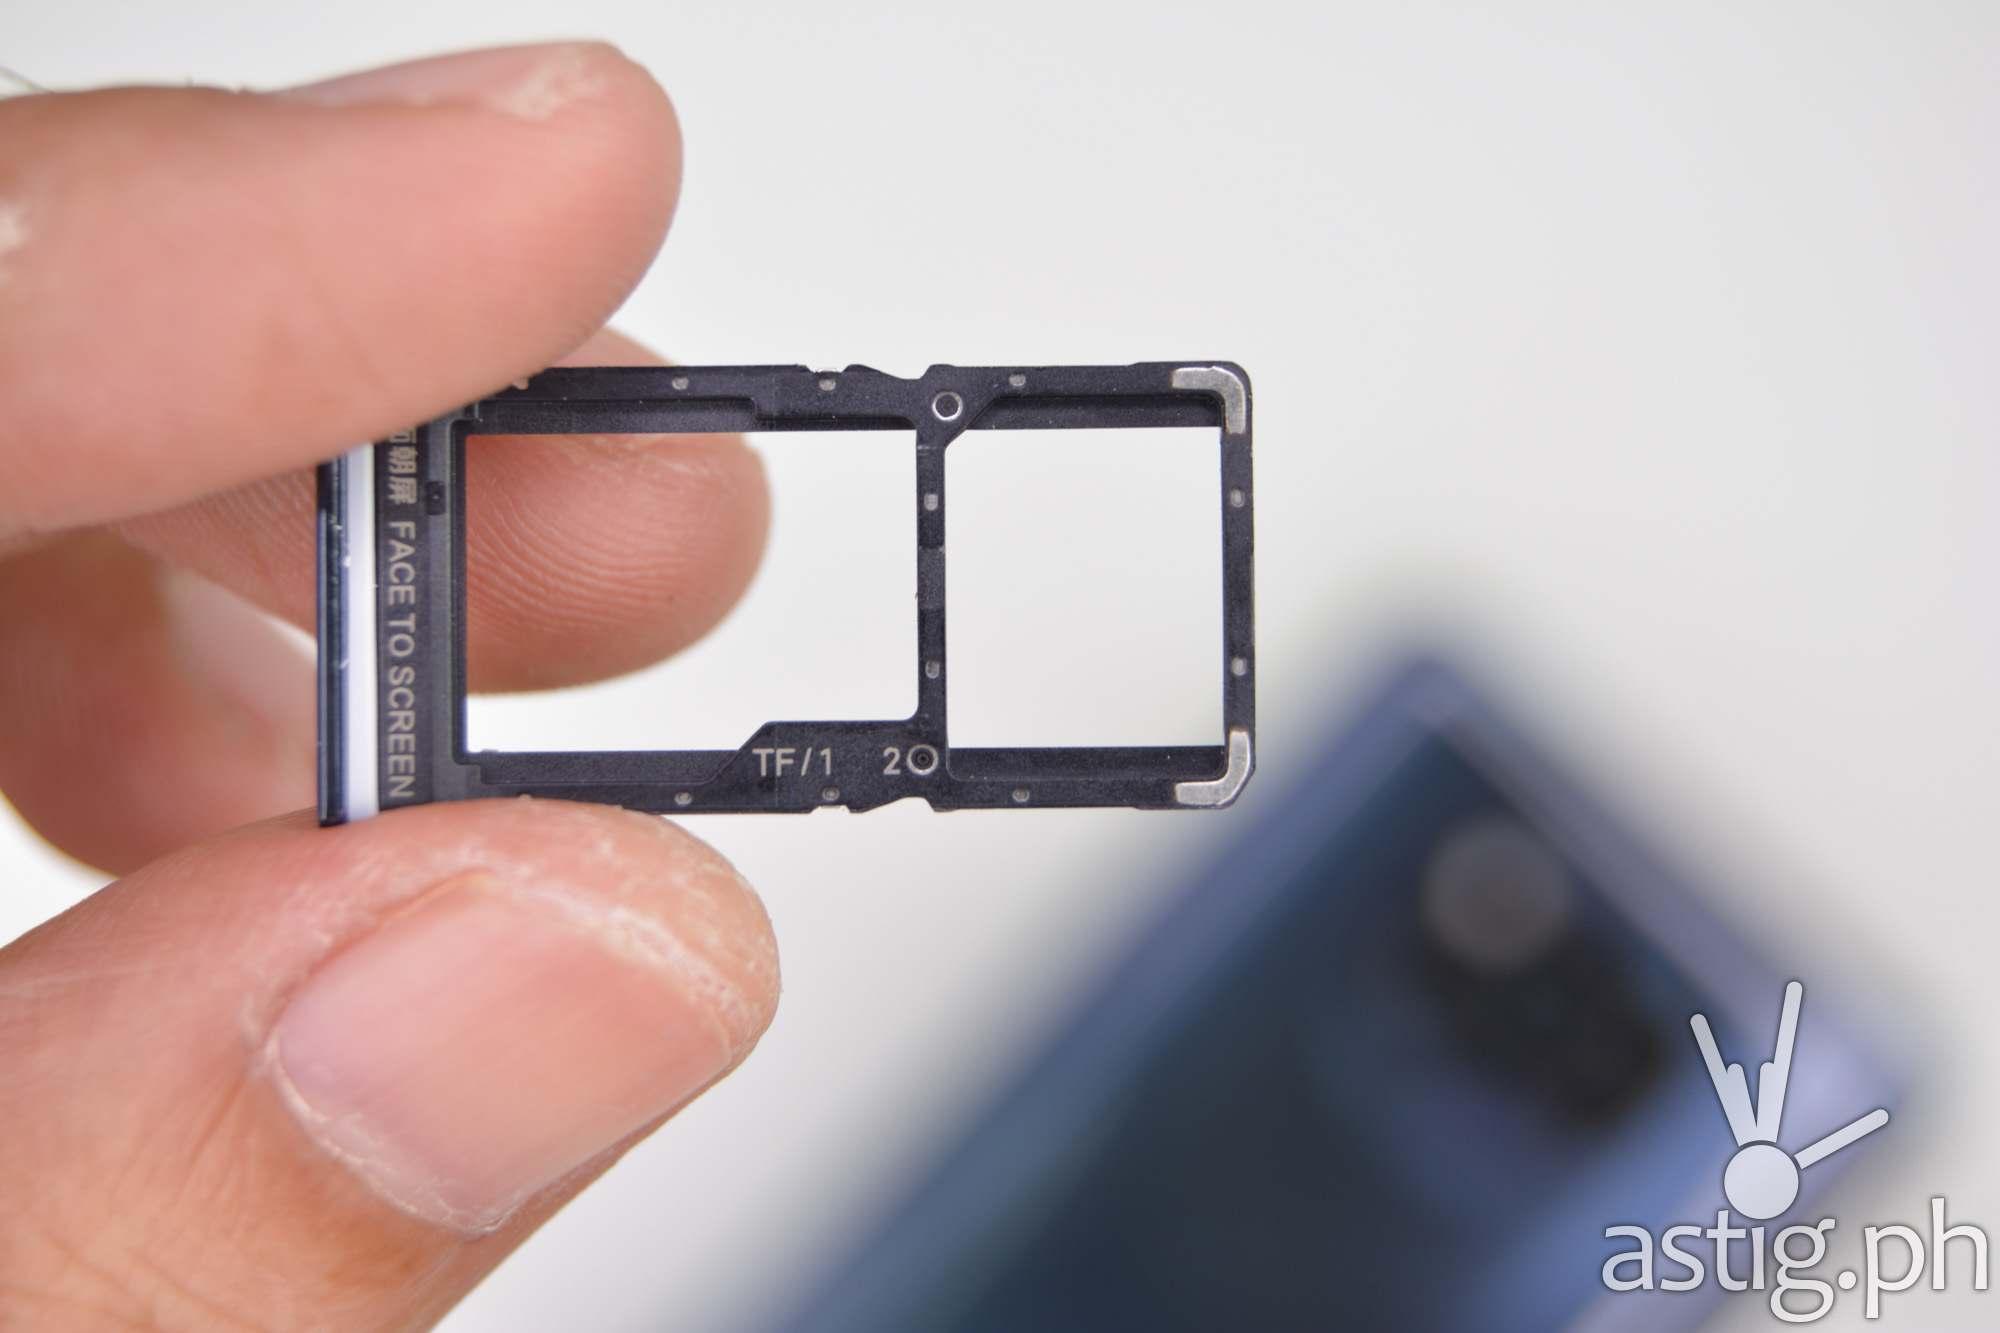 Hybrid dual SIM tray - 202009 POCO X3 NFC (Philippines)